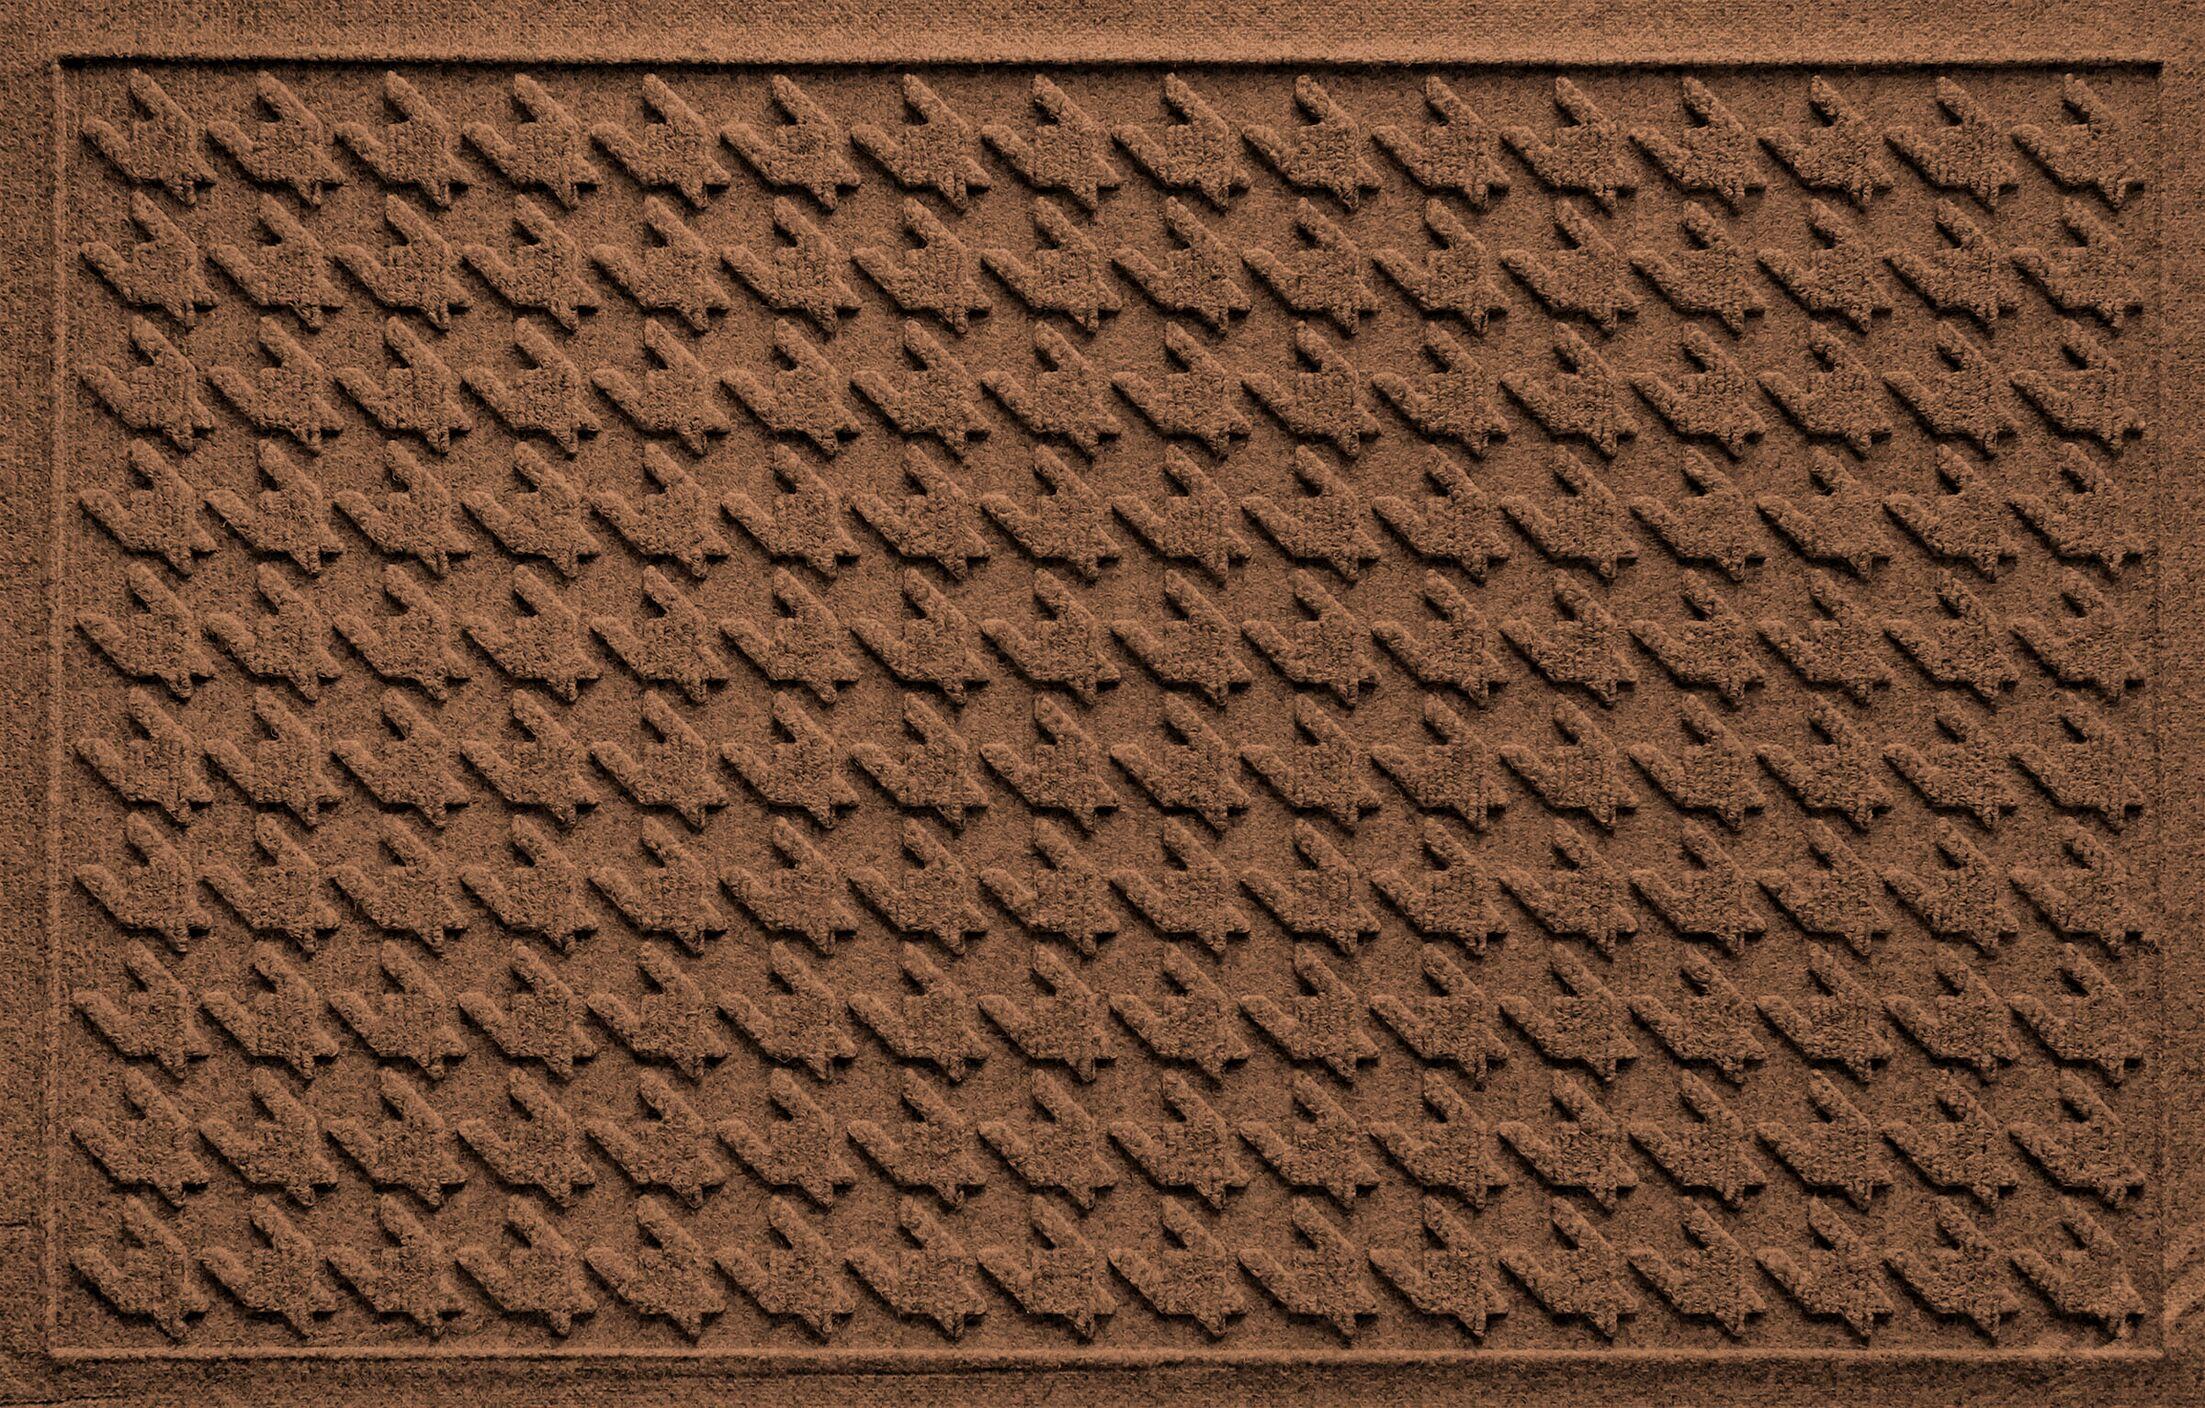 Shield Houndstooth Doormat Color: Dark Brown